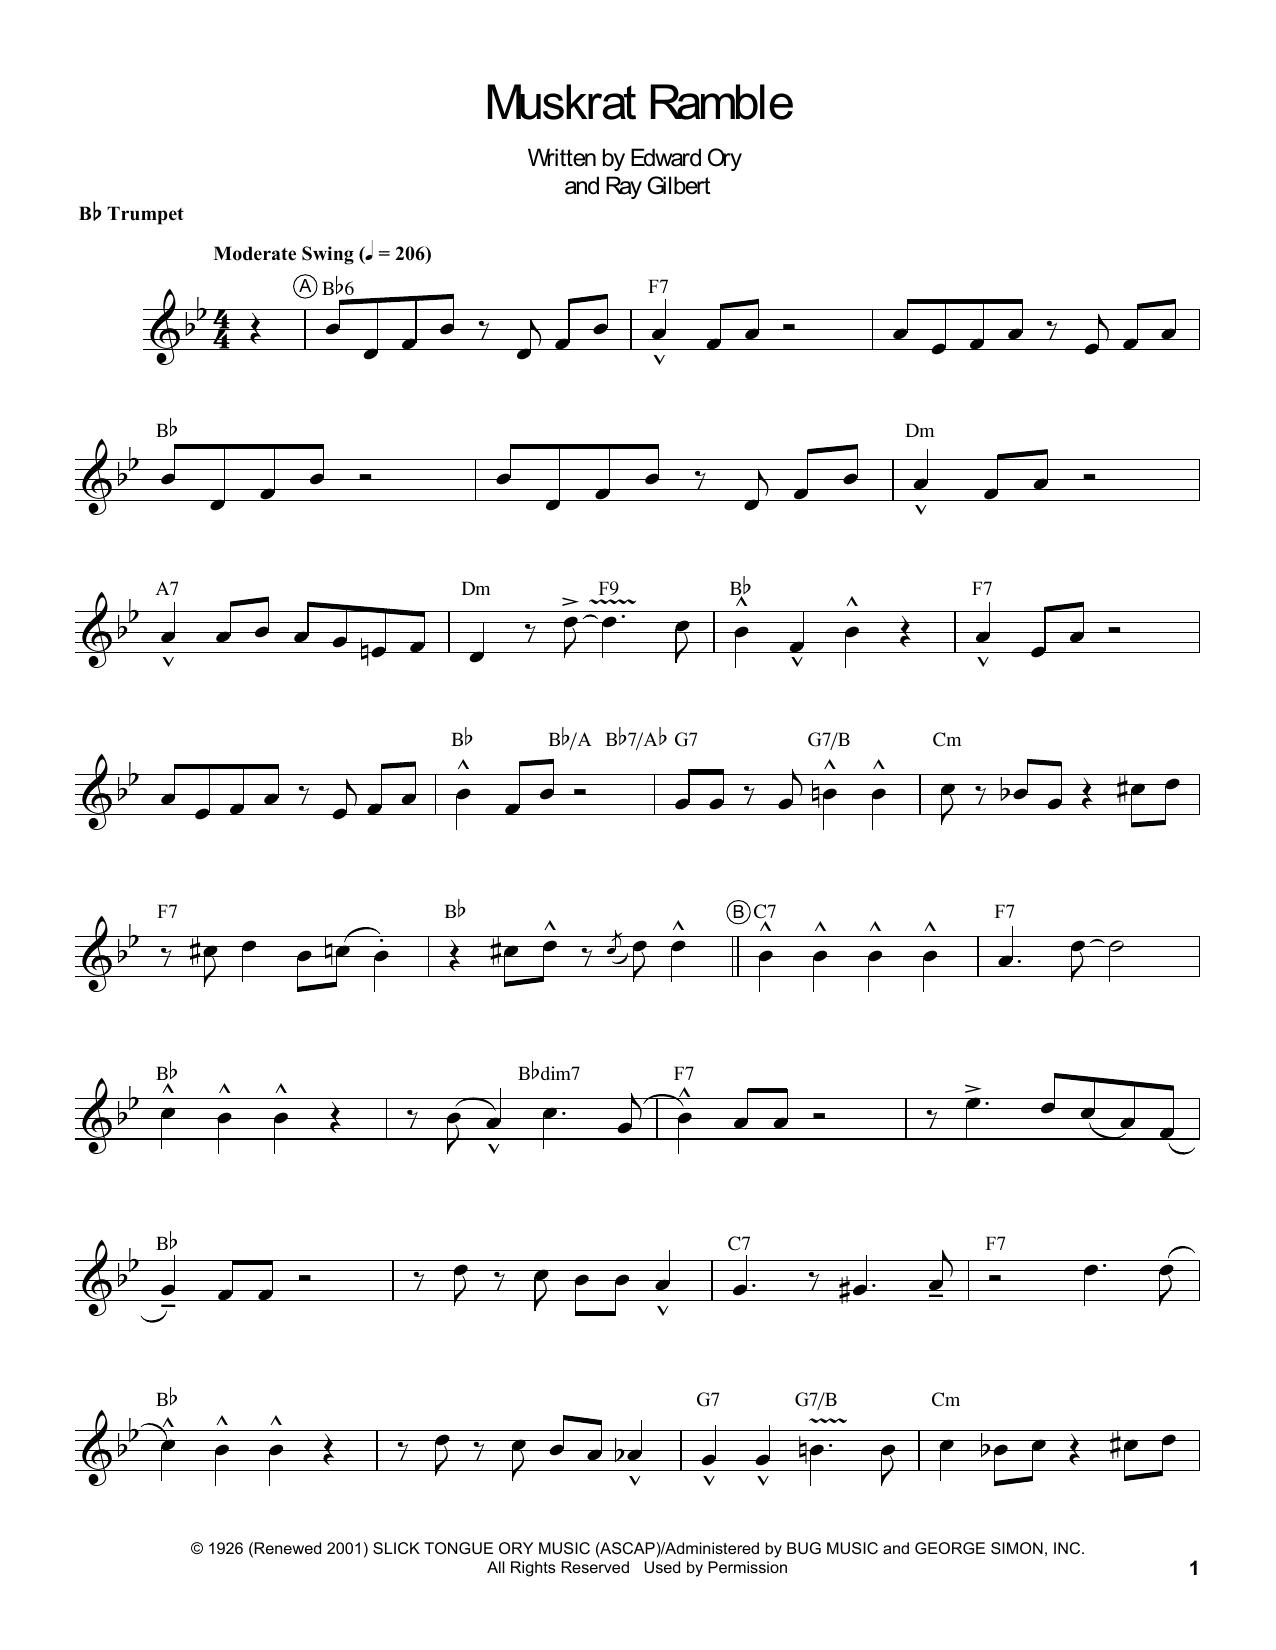 Muskrat Ramble Sheet Music